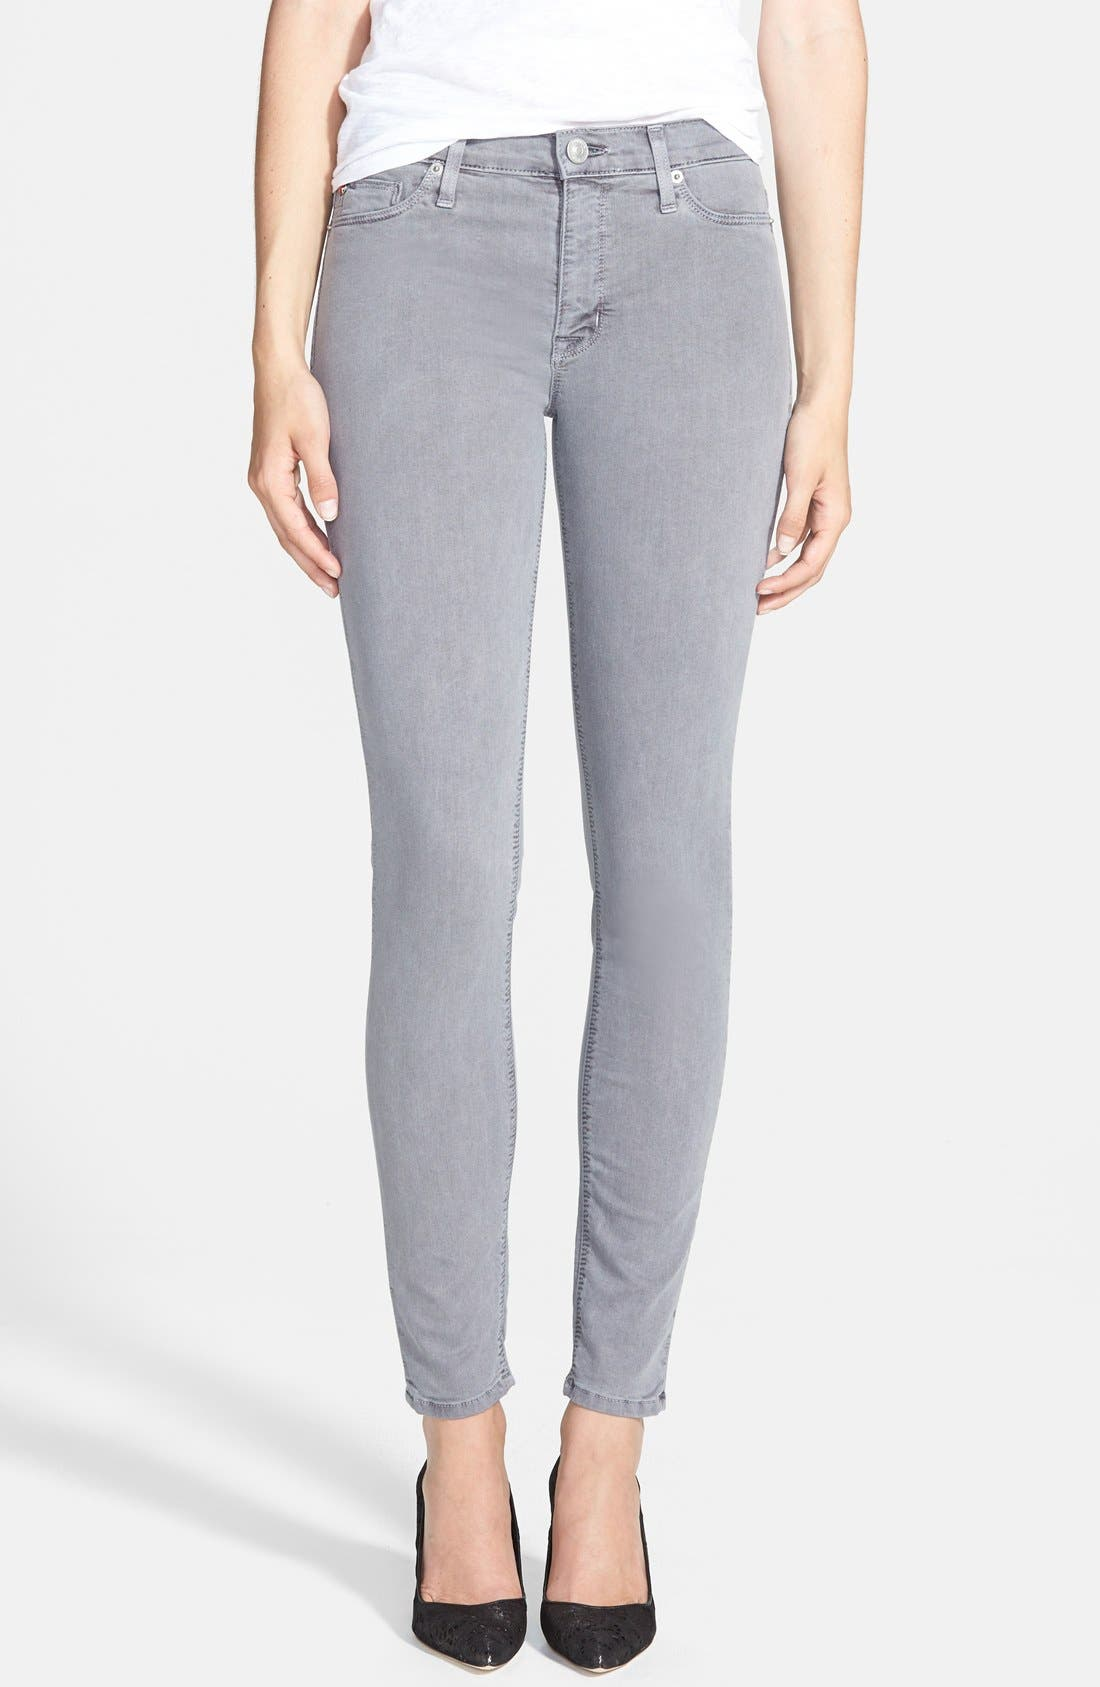 Alternate Image 1 Selected - Hudson Jeans 'Nico' Skinny Overdyed Jeans (Grey Wash)